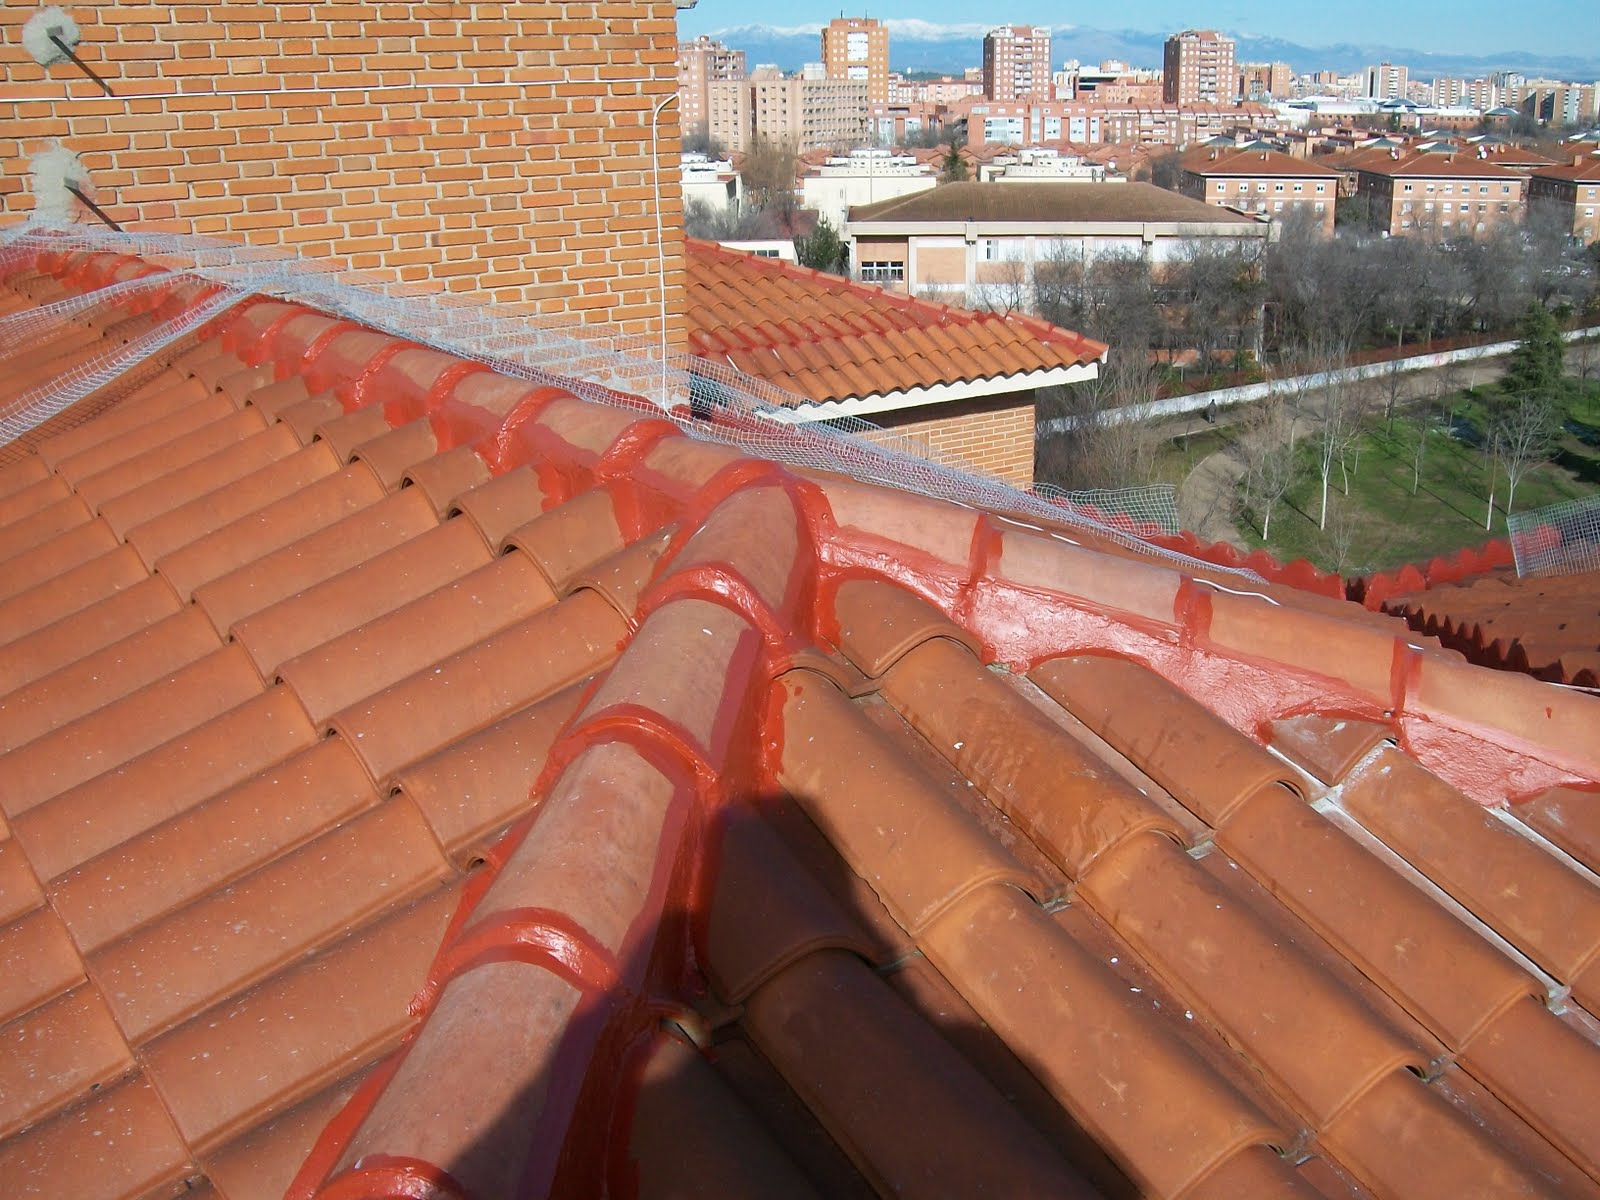 Impermeabilizar con clorocaucho pintura clorocaucho - Productos para impermeabilizar fachadas ...